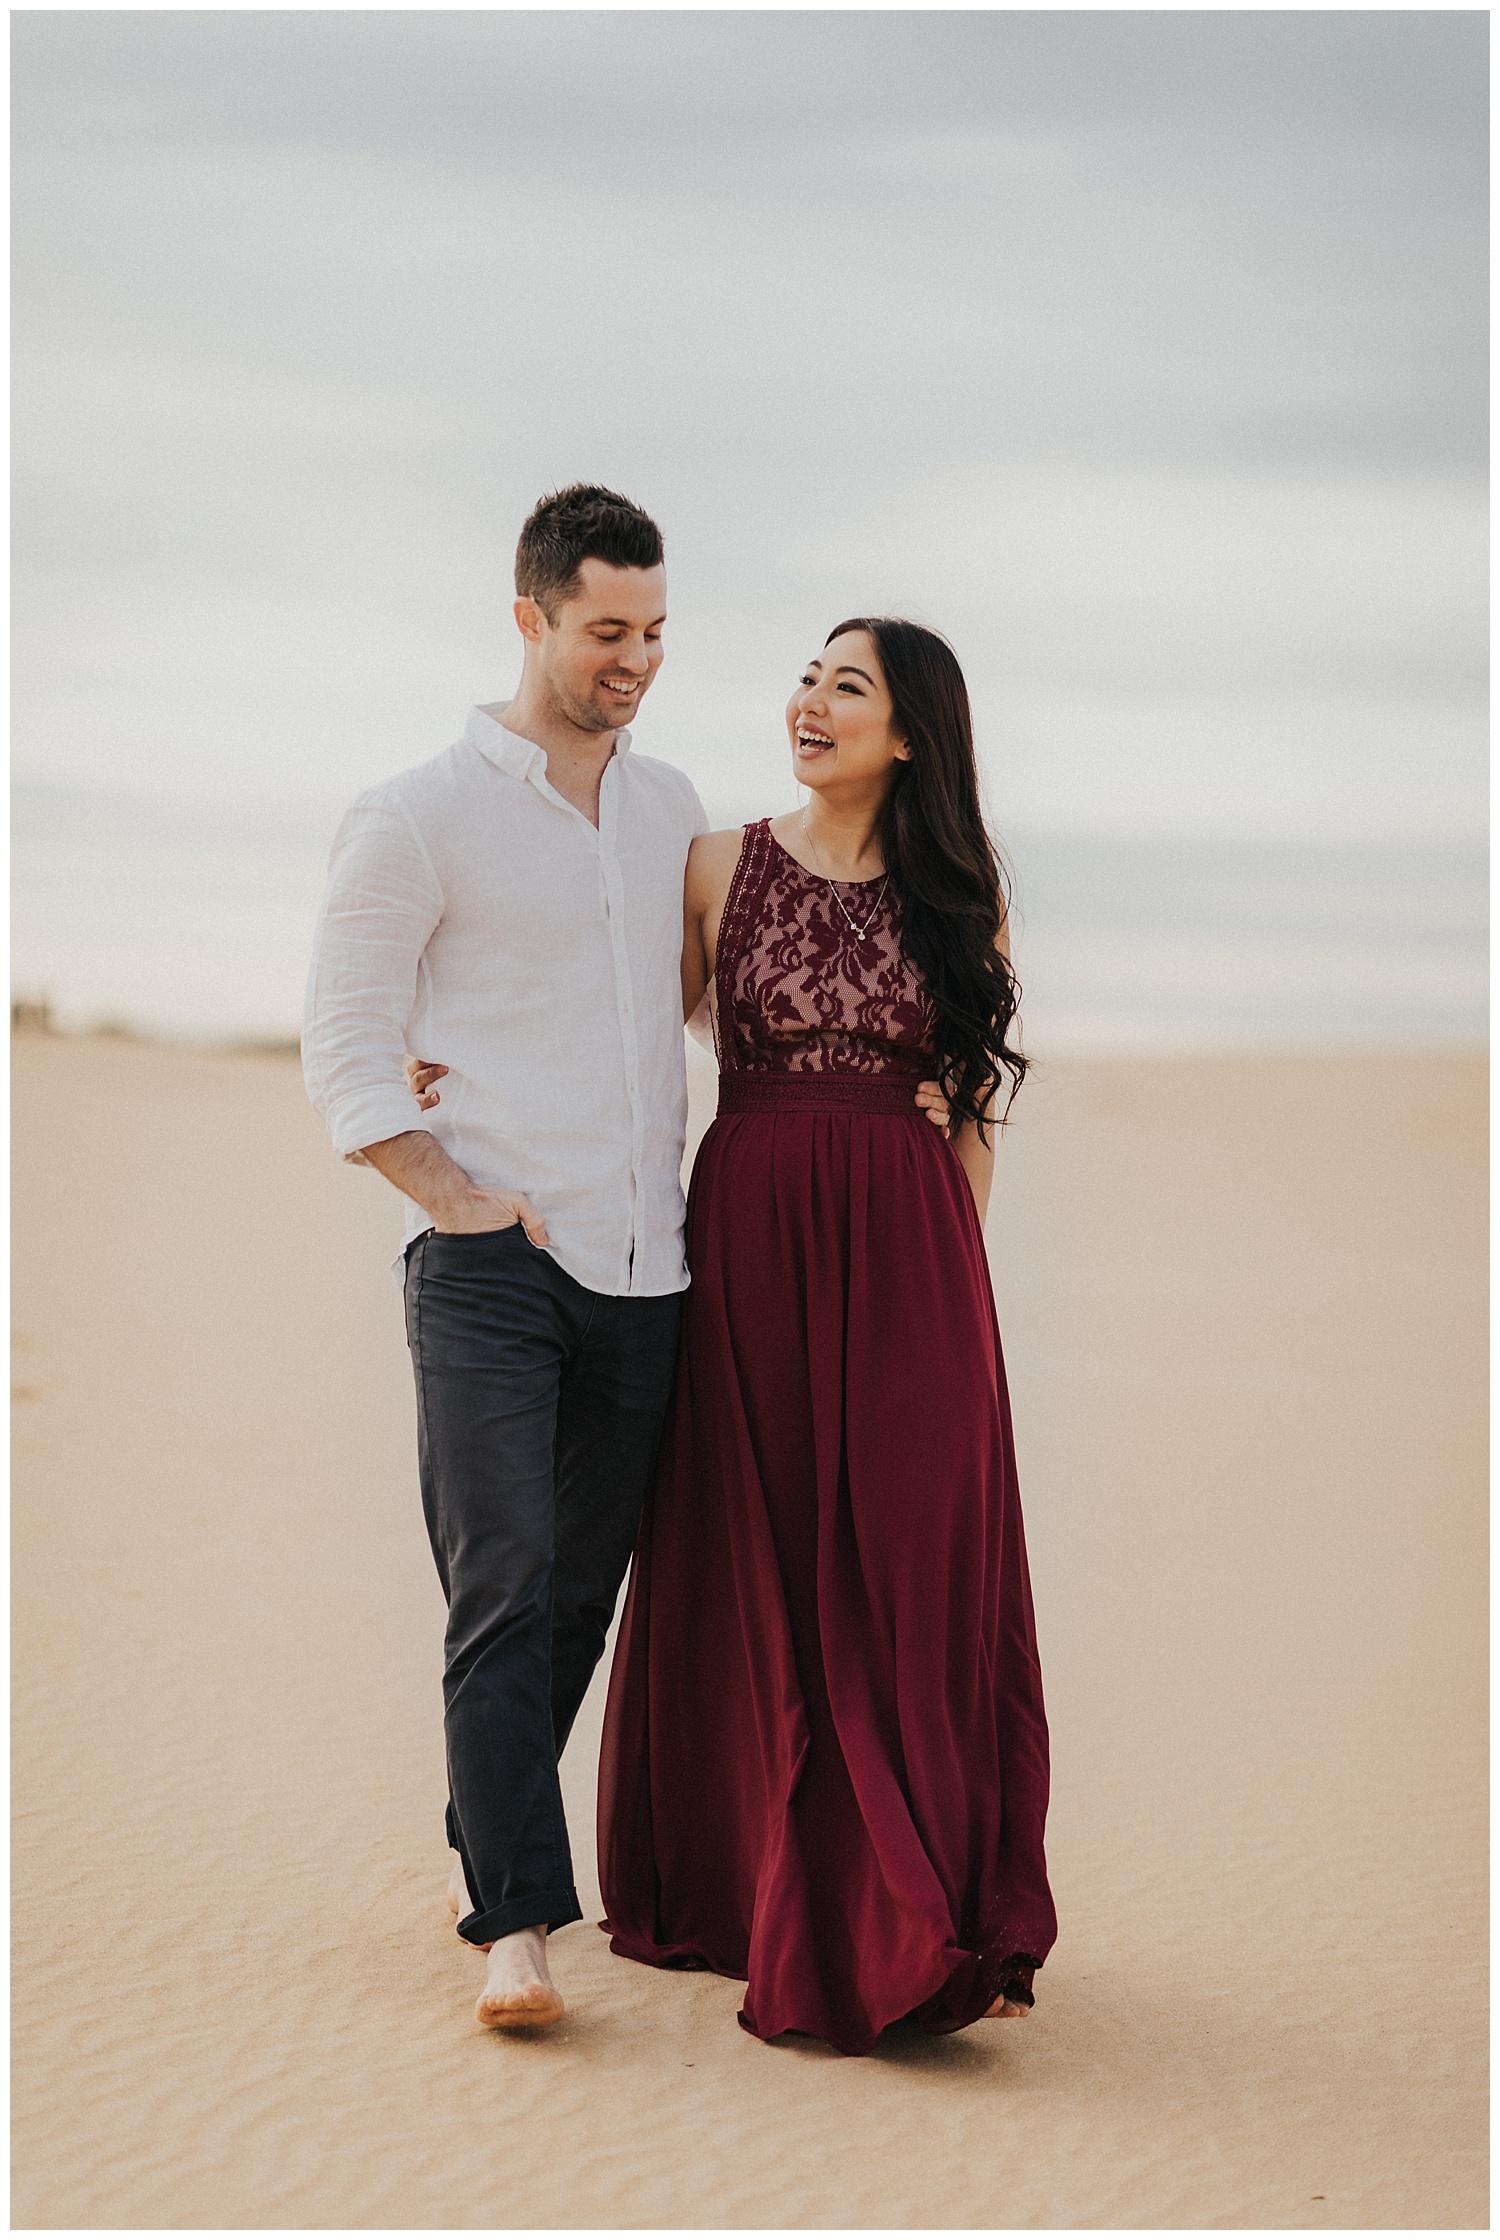 Cindy Rory Sand Dunes Pre Wedding Russell Stafford Photography Sydney Wedding Photographer,Mermaid Wedding Wedding Dresses No Sleeves